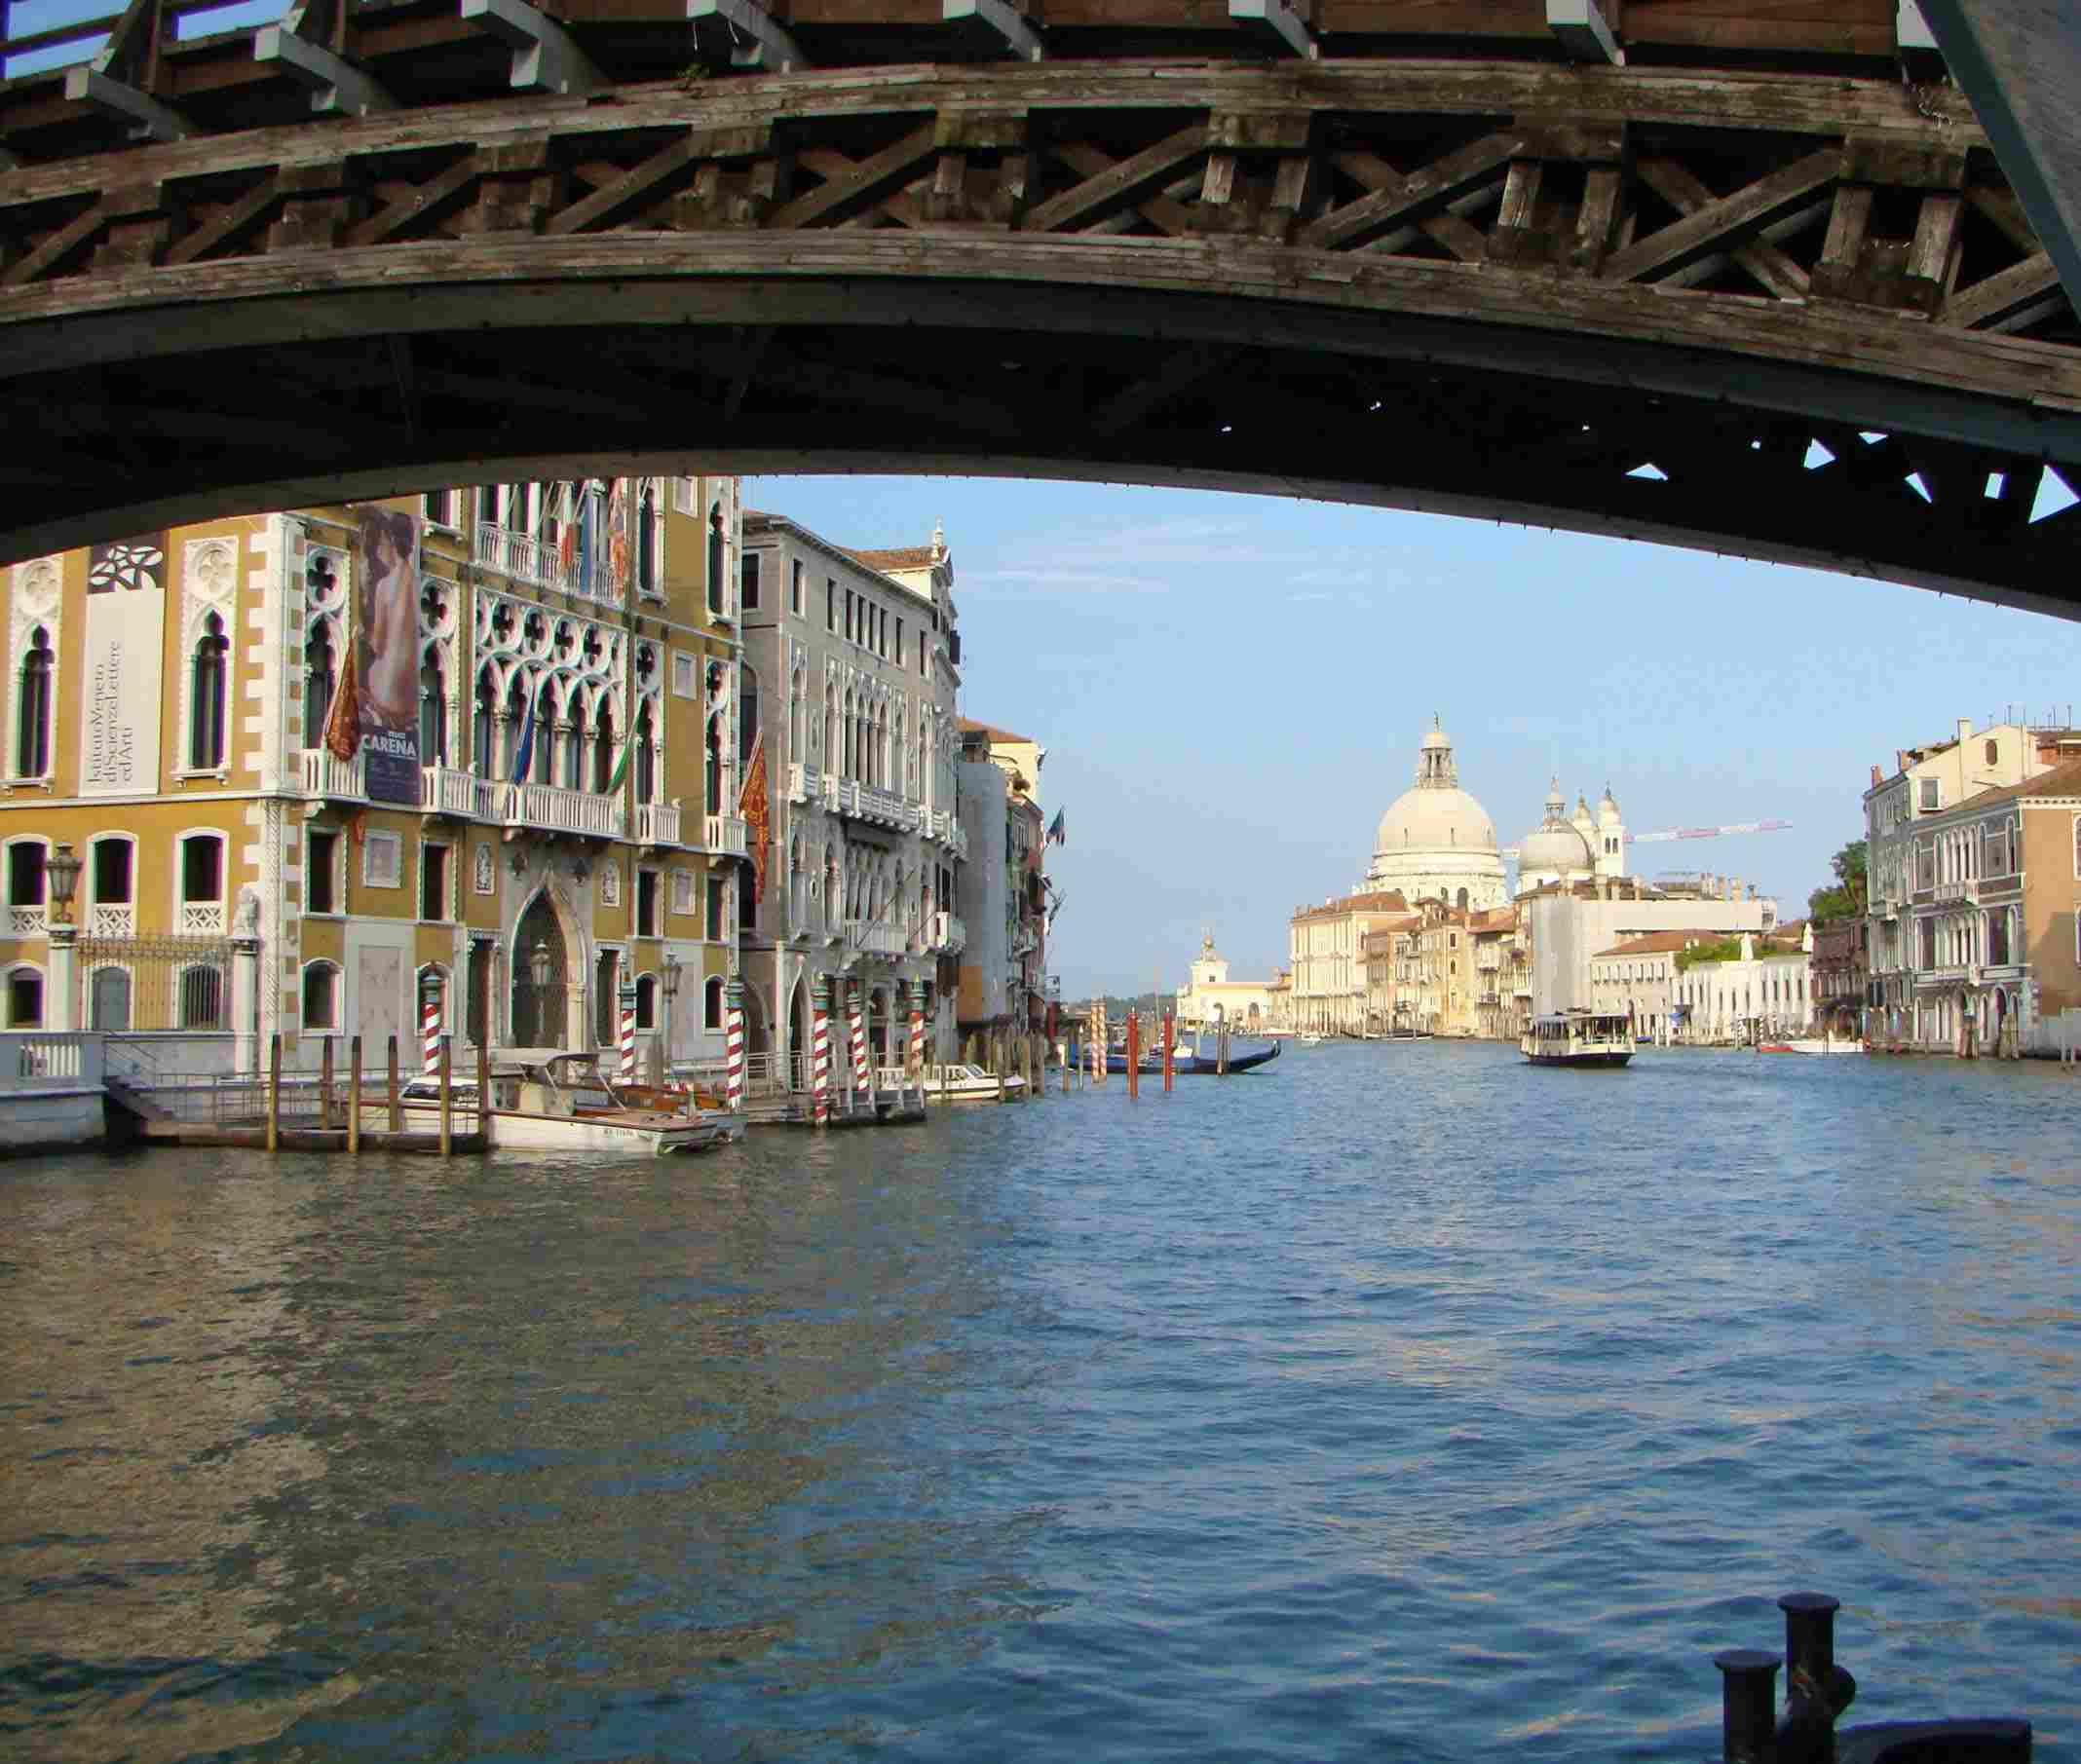 Vaporetto rides provide a cheap way to admire the architecture of Venice, Italy.